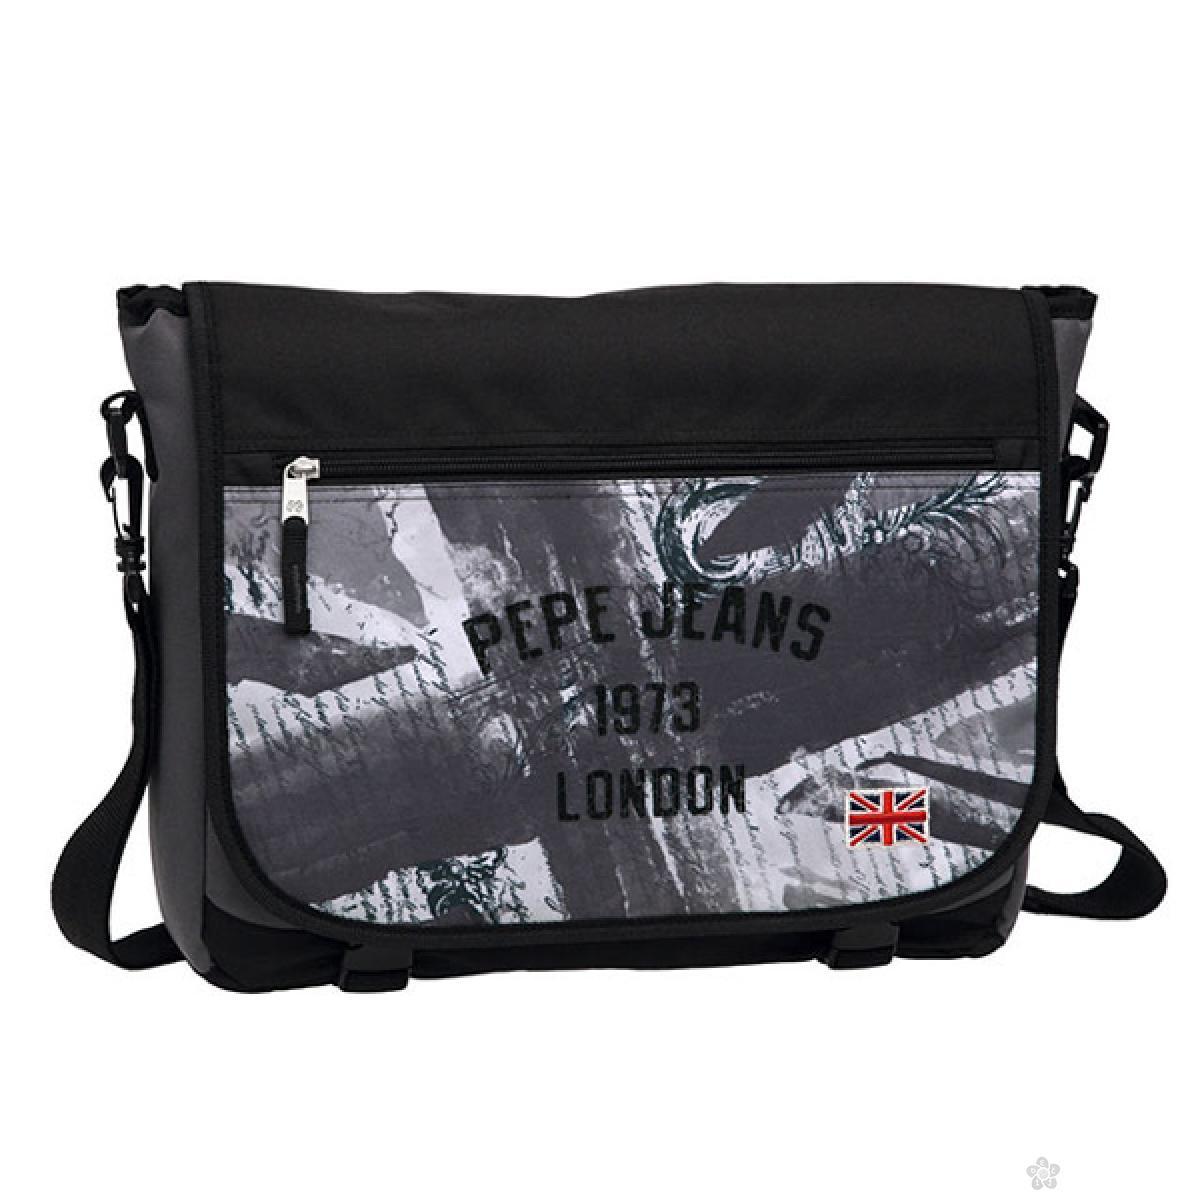 Pepe Jeans torba na rame za lapt top 60.850.51